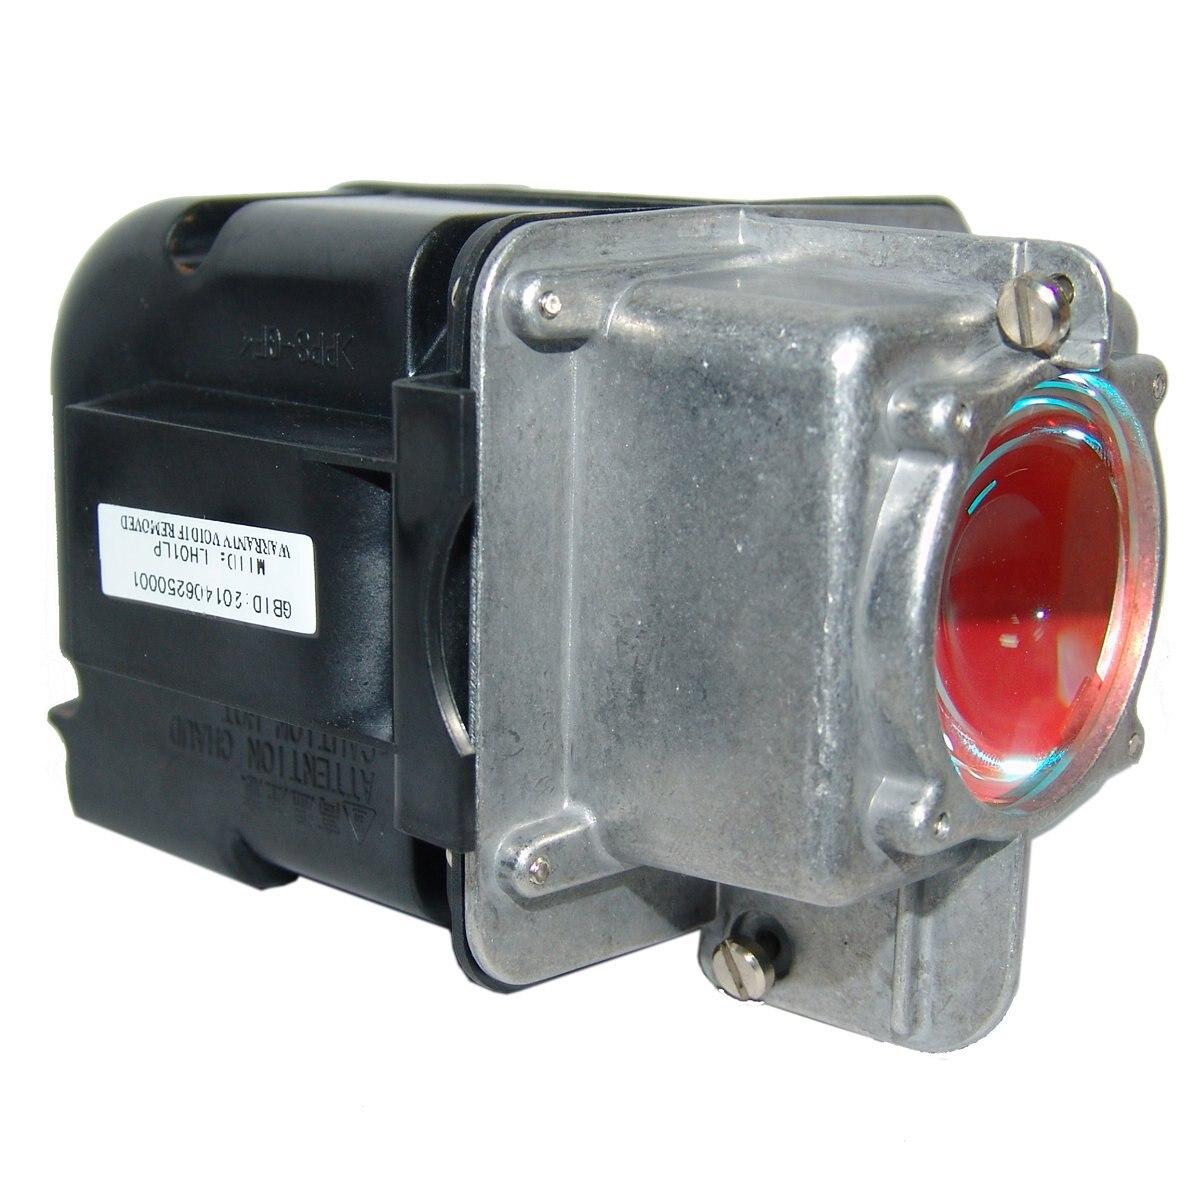 LH01LP LH-01LP For NEC HT410 HT510 Projector Bulb Lamp with housing compatible lamp bulb lh01lp for nec ht410 ht510 projectors